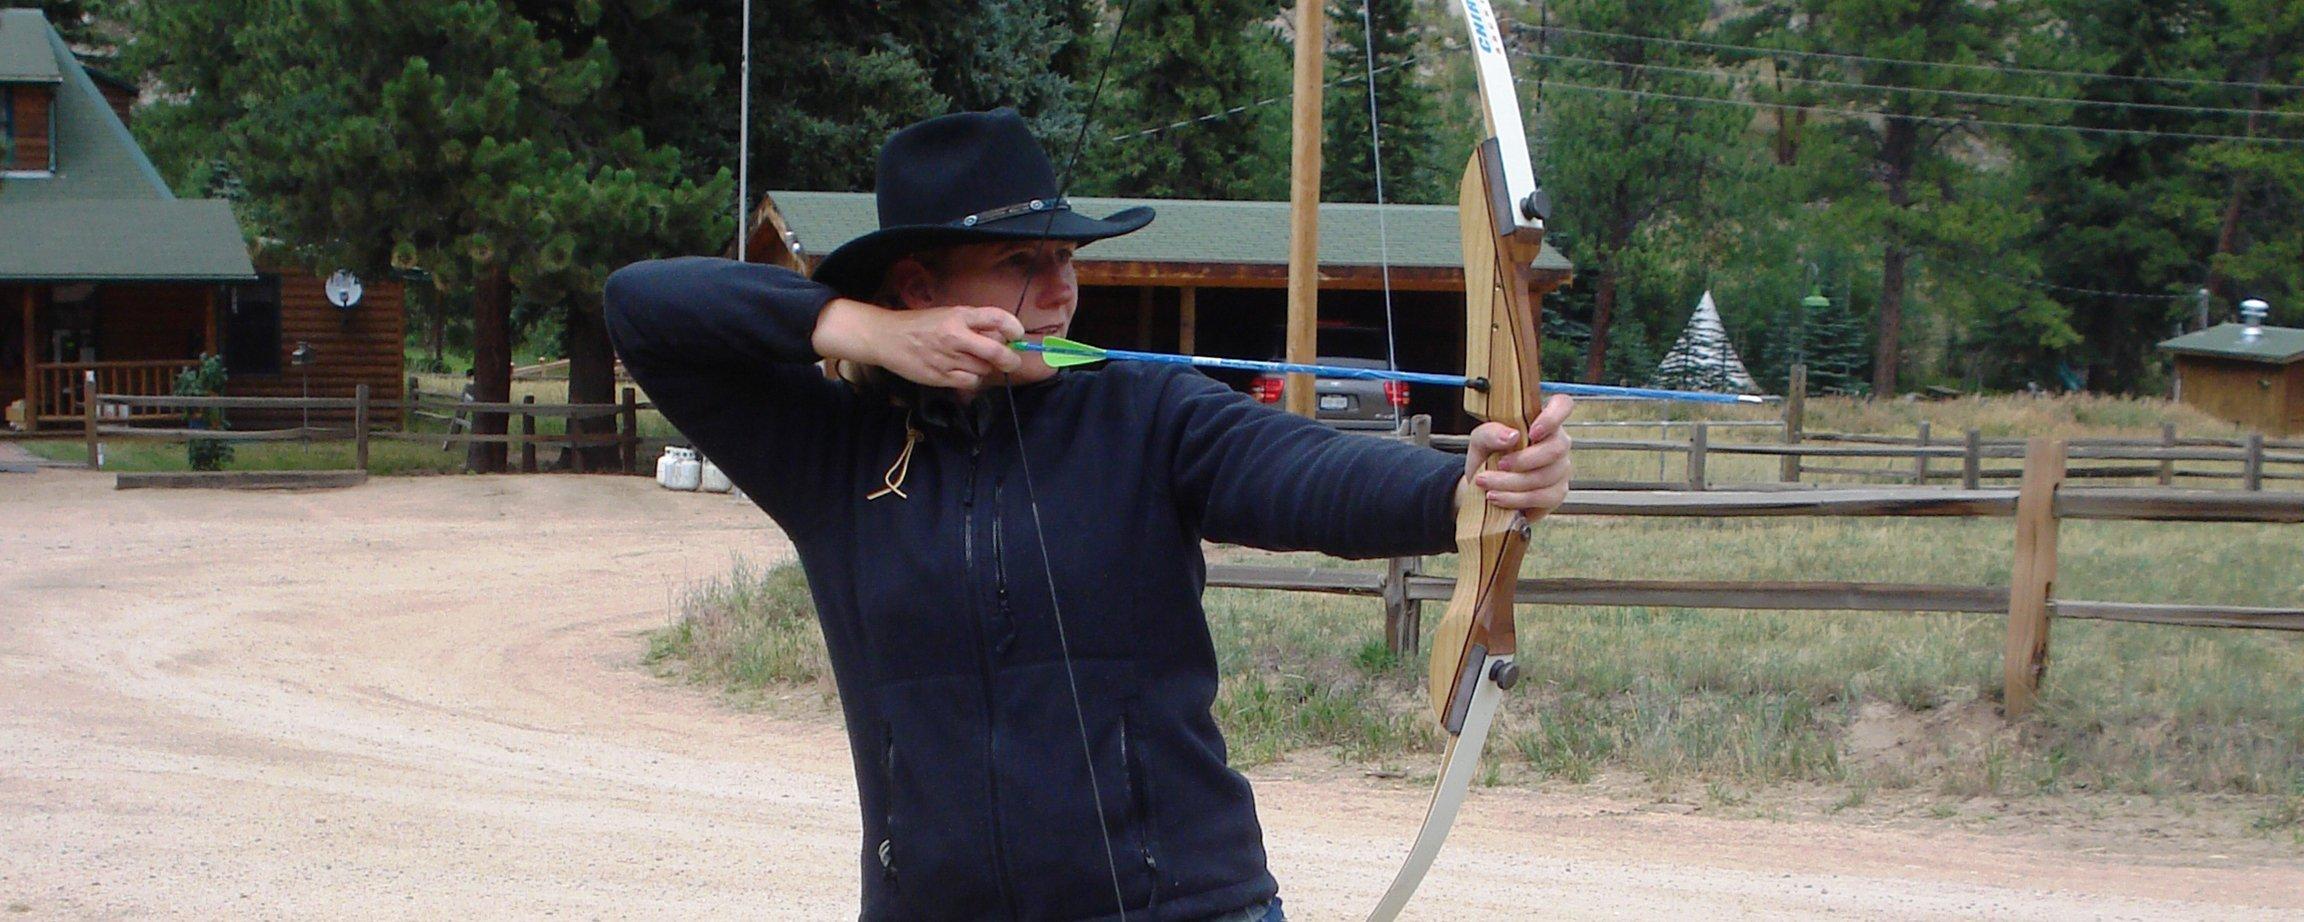 North Fork Ranch Target Shooting